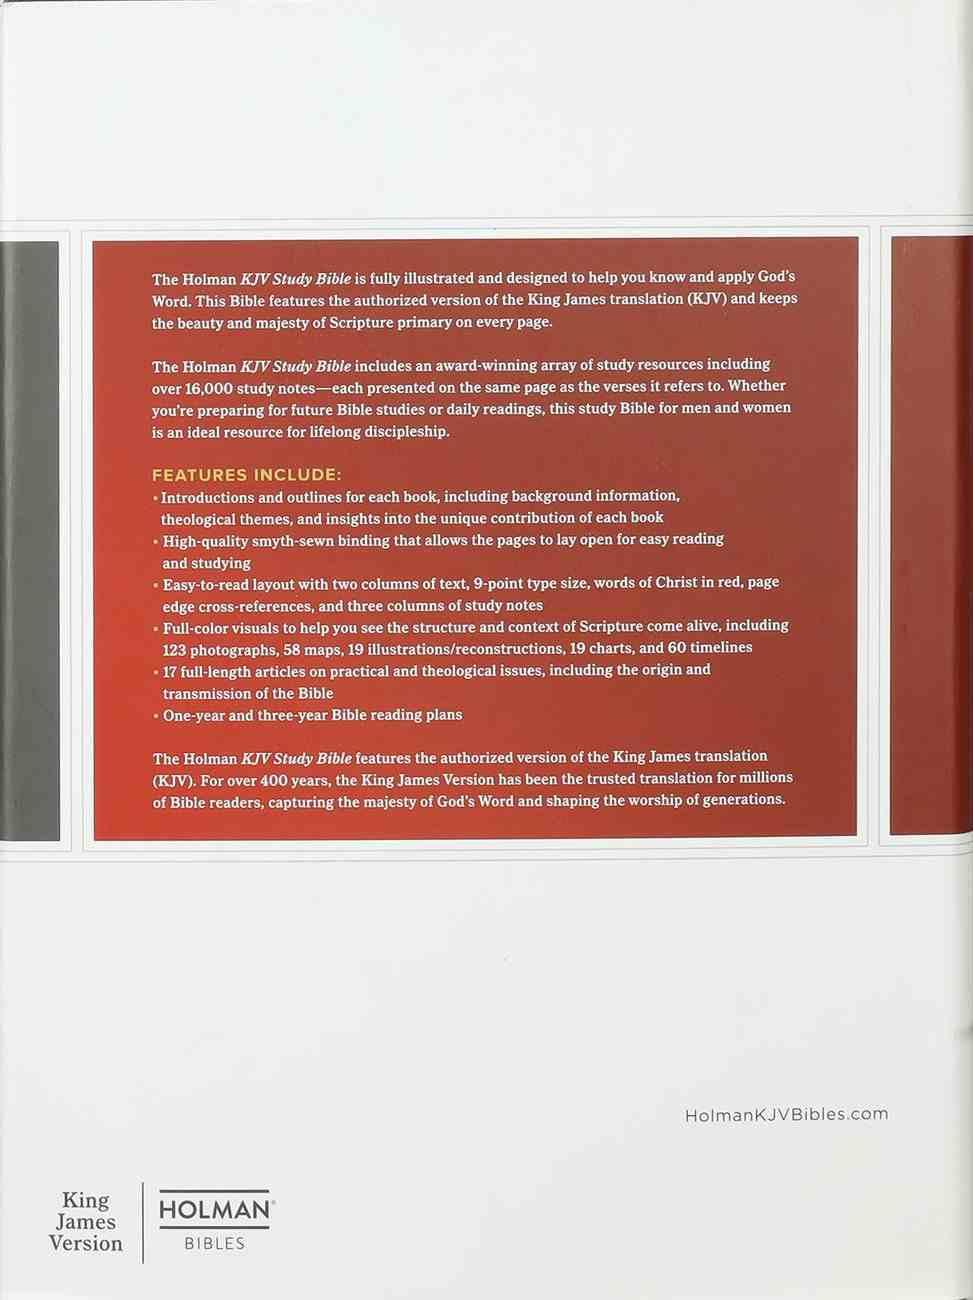 KJV Study Bible Full-Color Charcoal Fabric Over Hardback